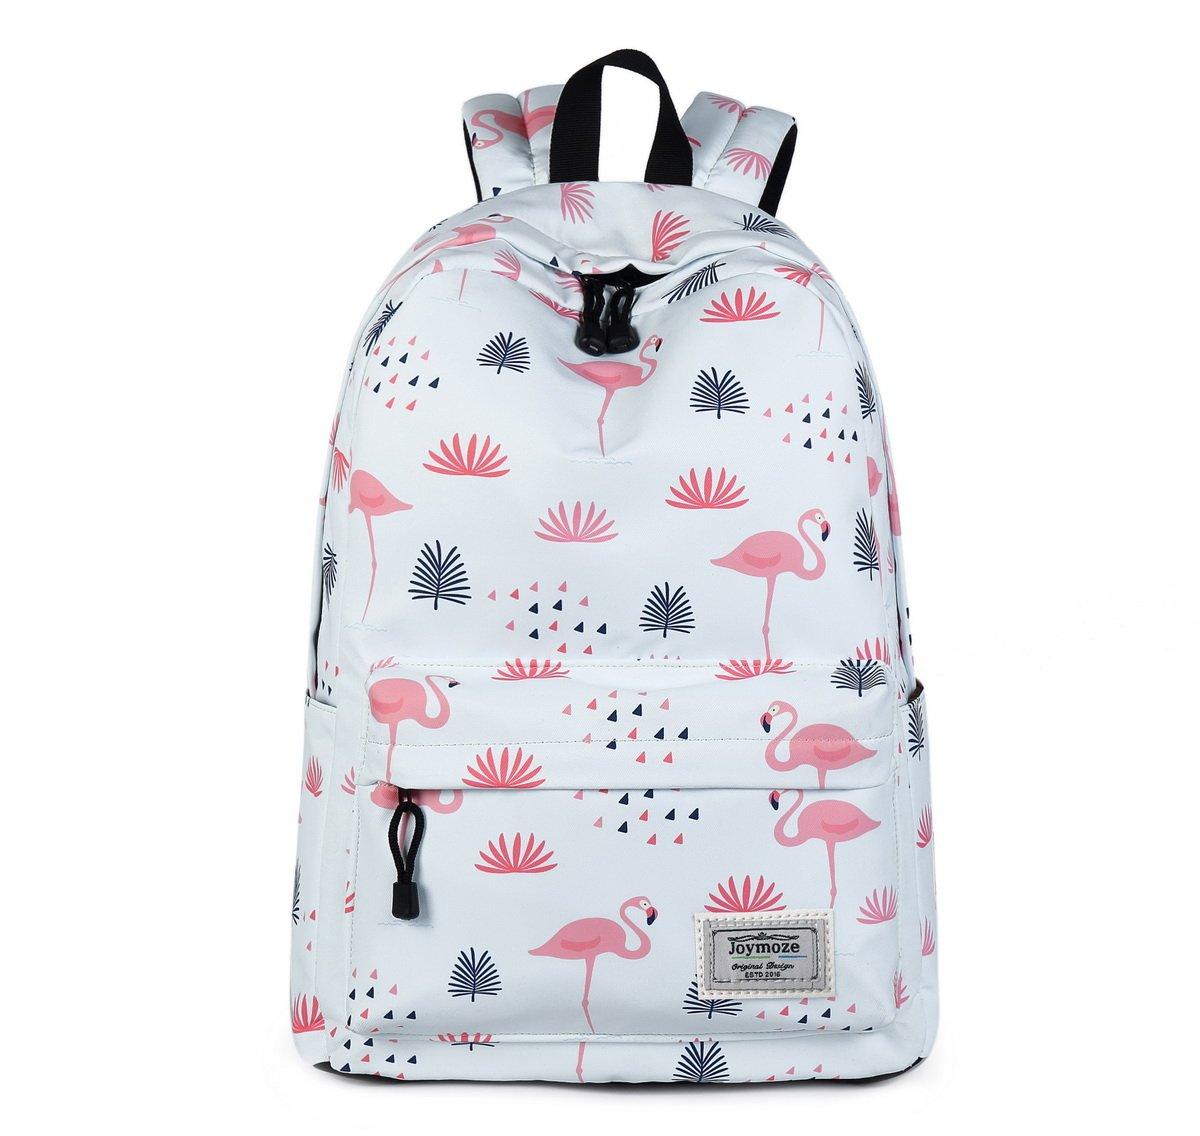 c75617502ad Joymoze Fashion Leisure Backpack for Girls Teenage School Backpack Women  Print Backpack Purse Flamingos durable service